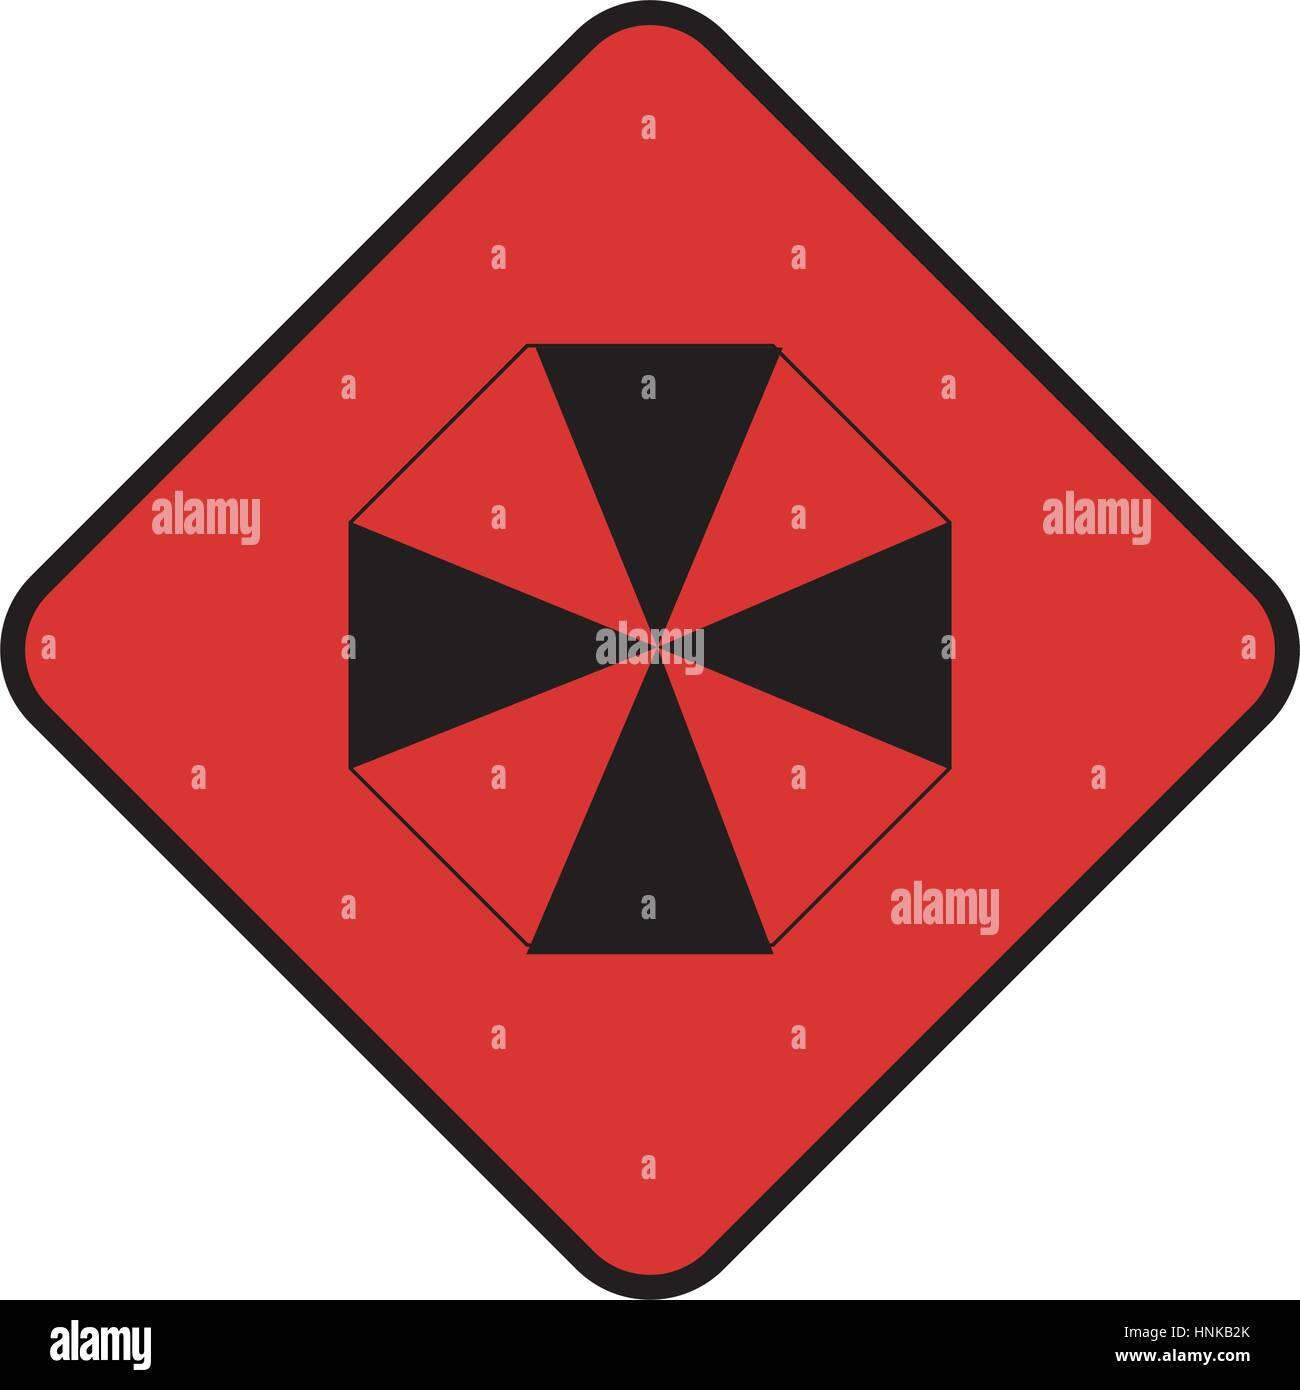 Alerting stock vector images alamy diamond shape with hazard symbol vector illustration stock vector biocorpaavc Gallery